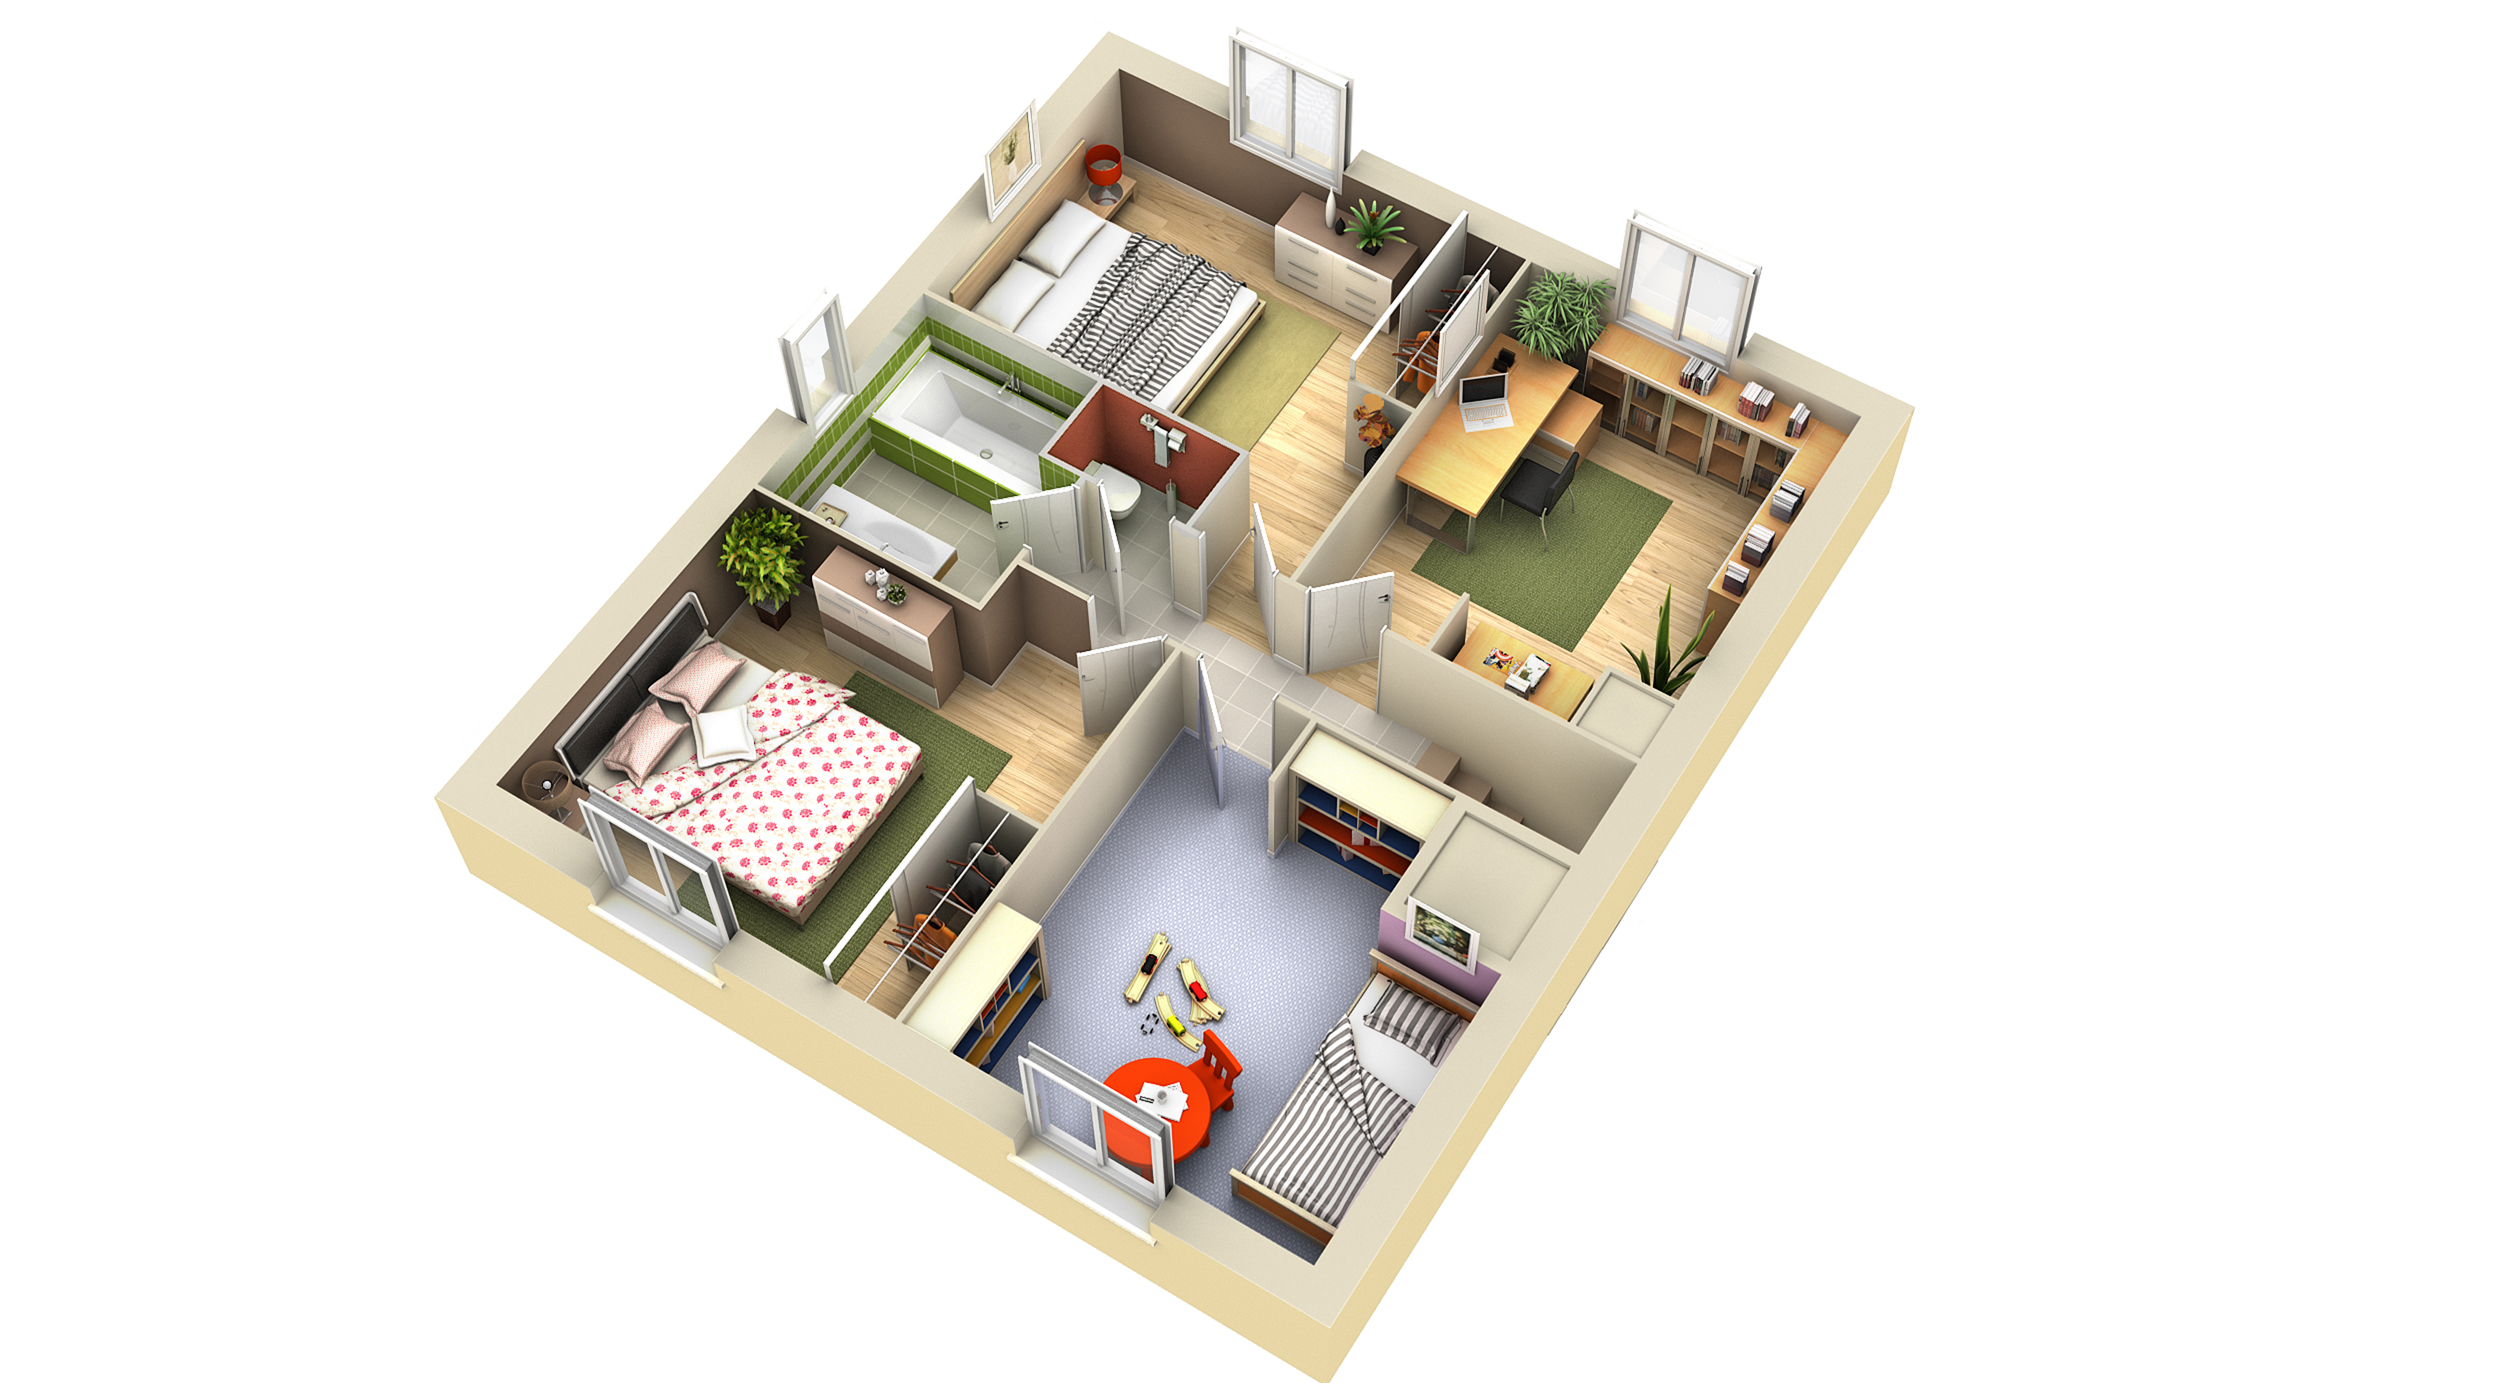 plan maison contemporaine carambole villas club. Black Bedroom Furniture Sets. Home Design Ideas